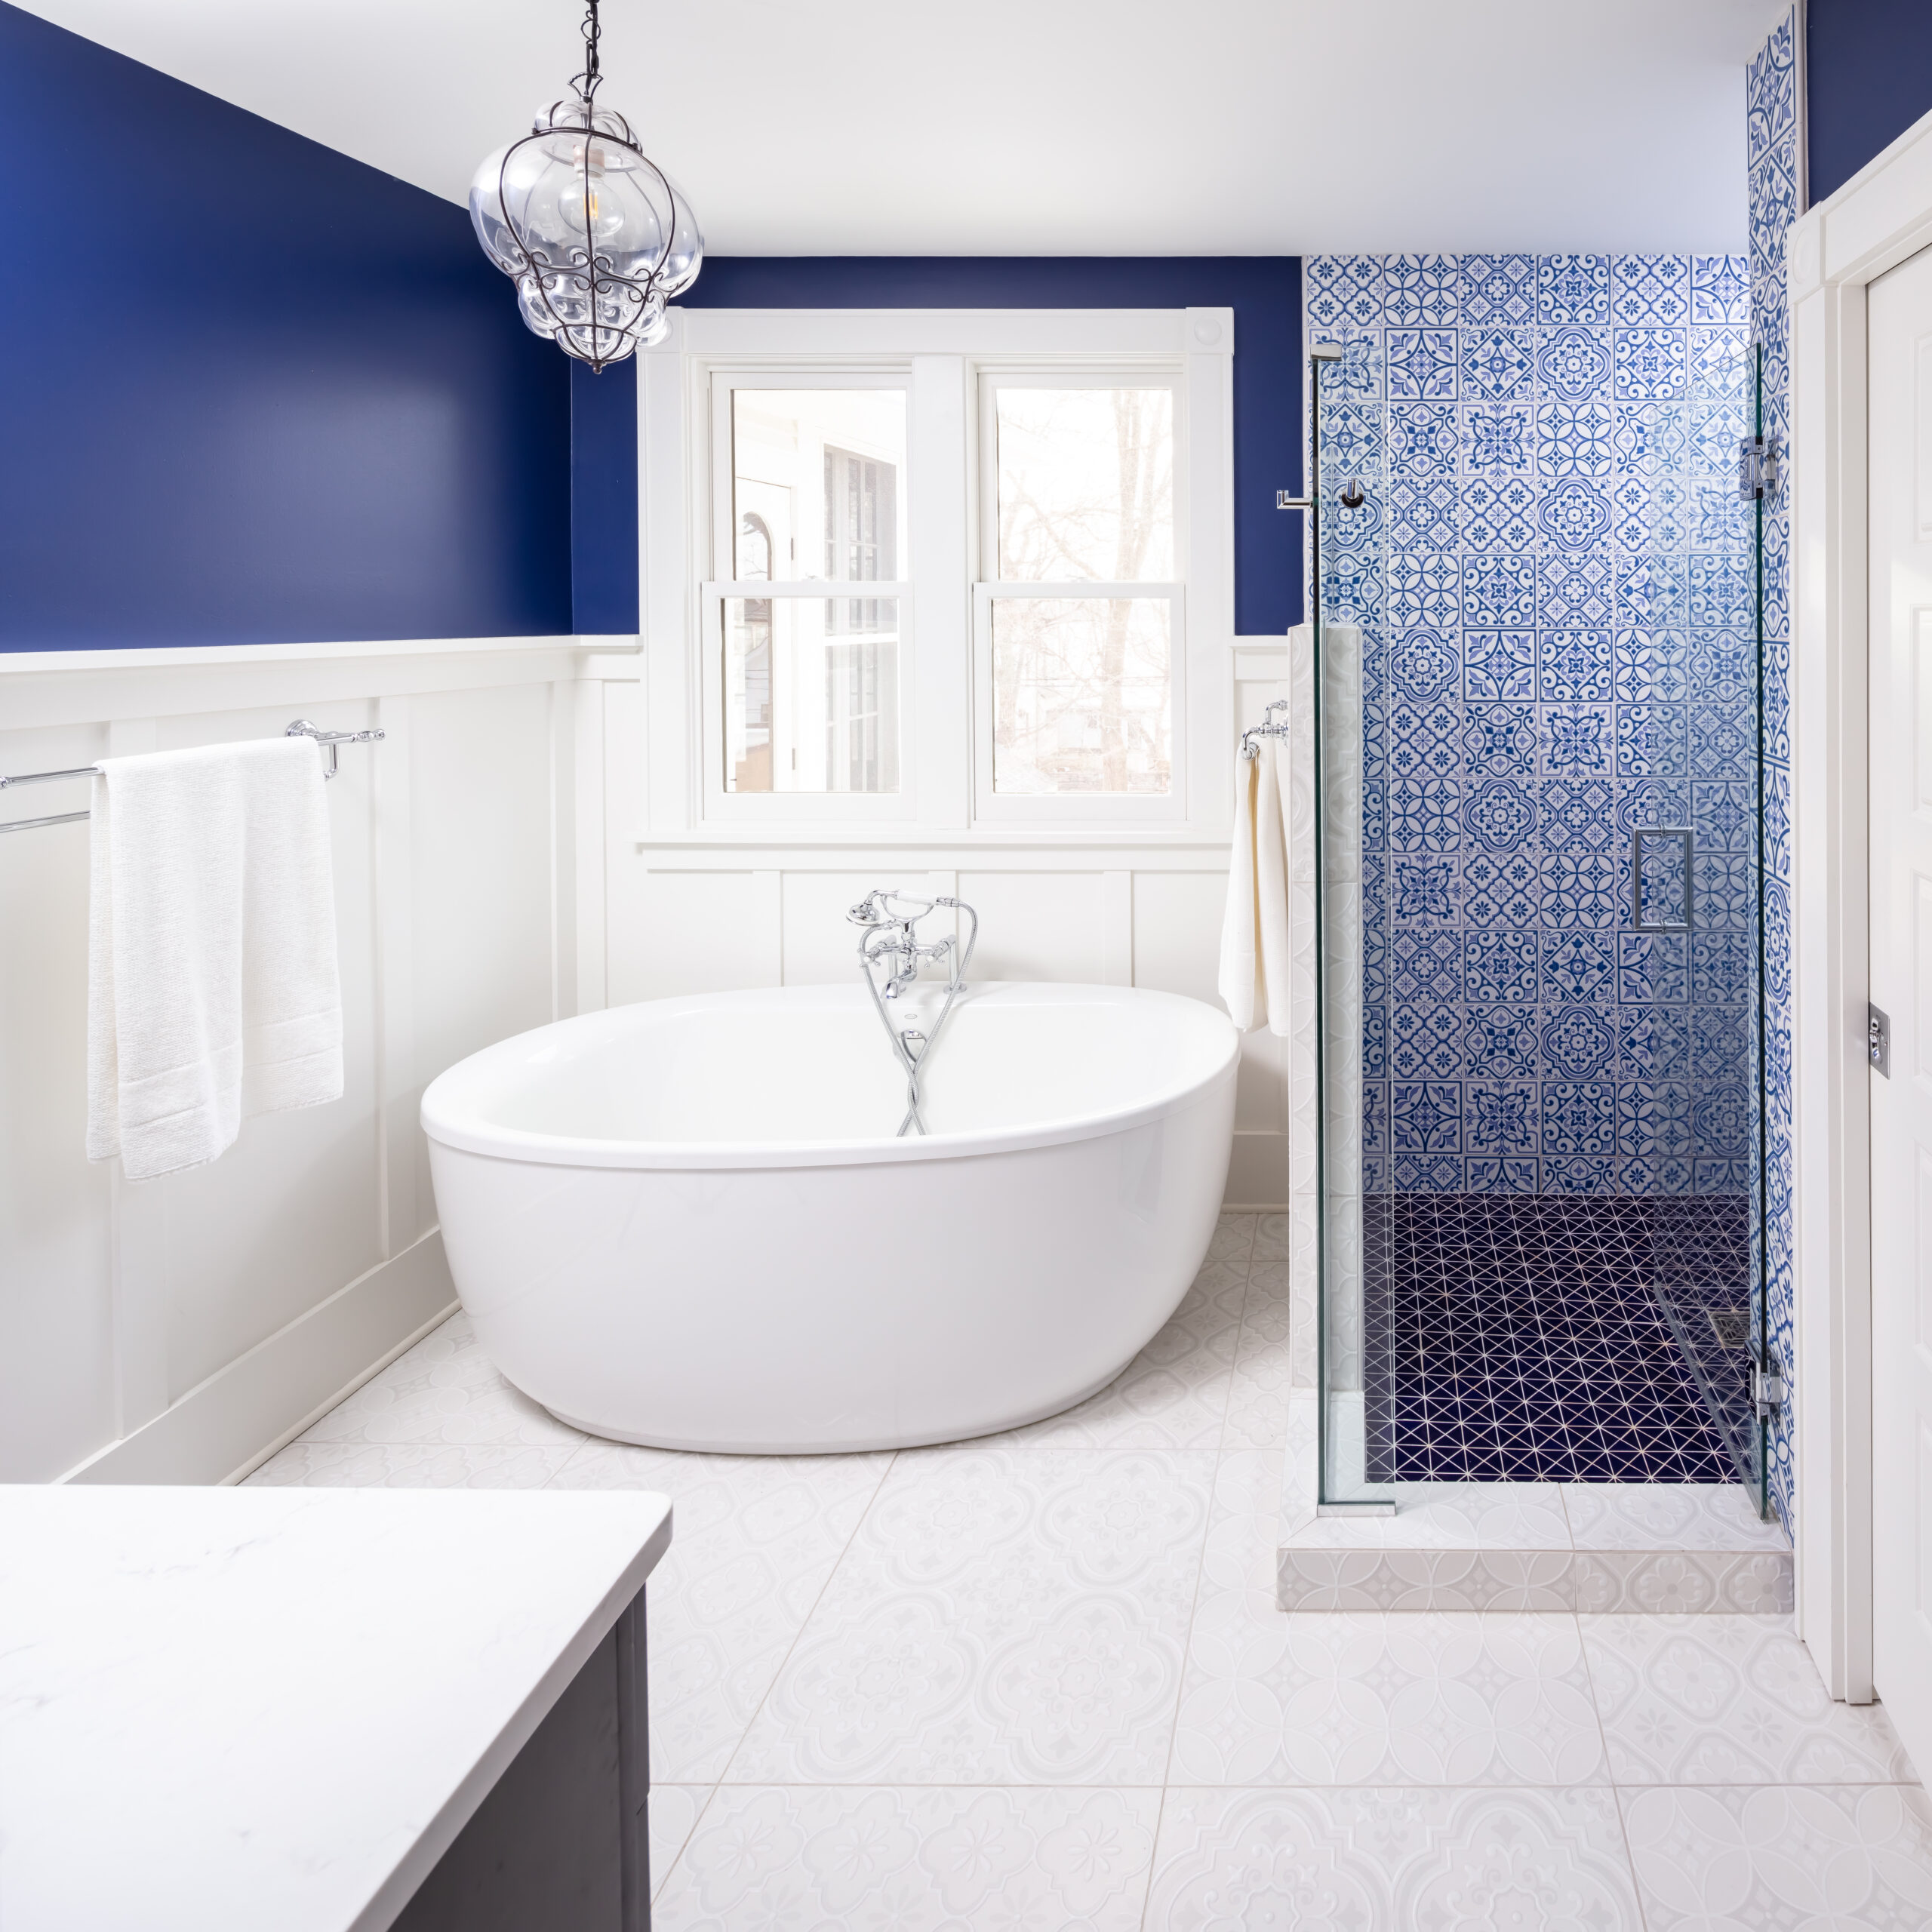 Designer Tips for A Luxurious Bathroom Renovation